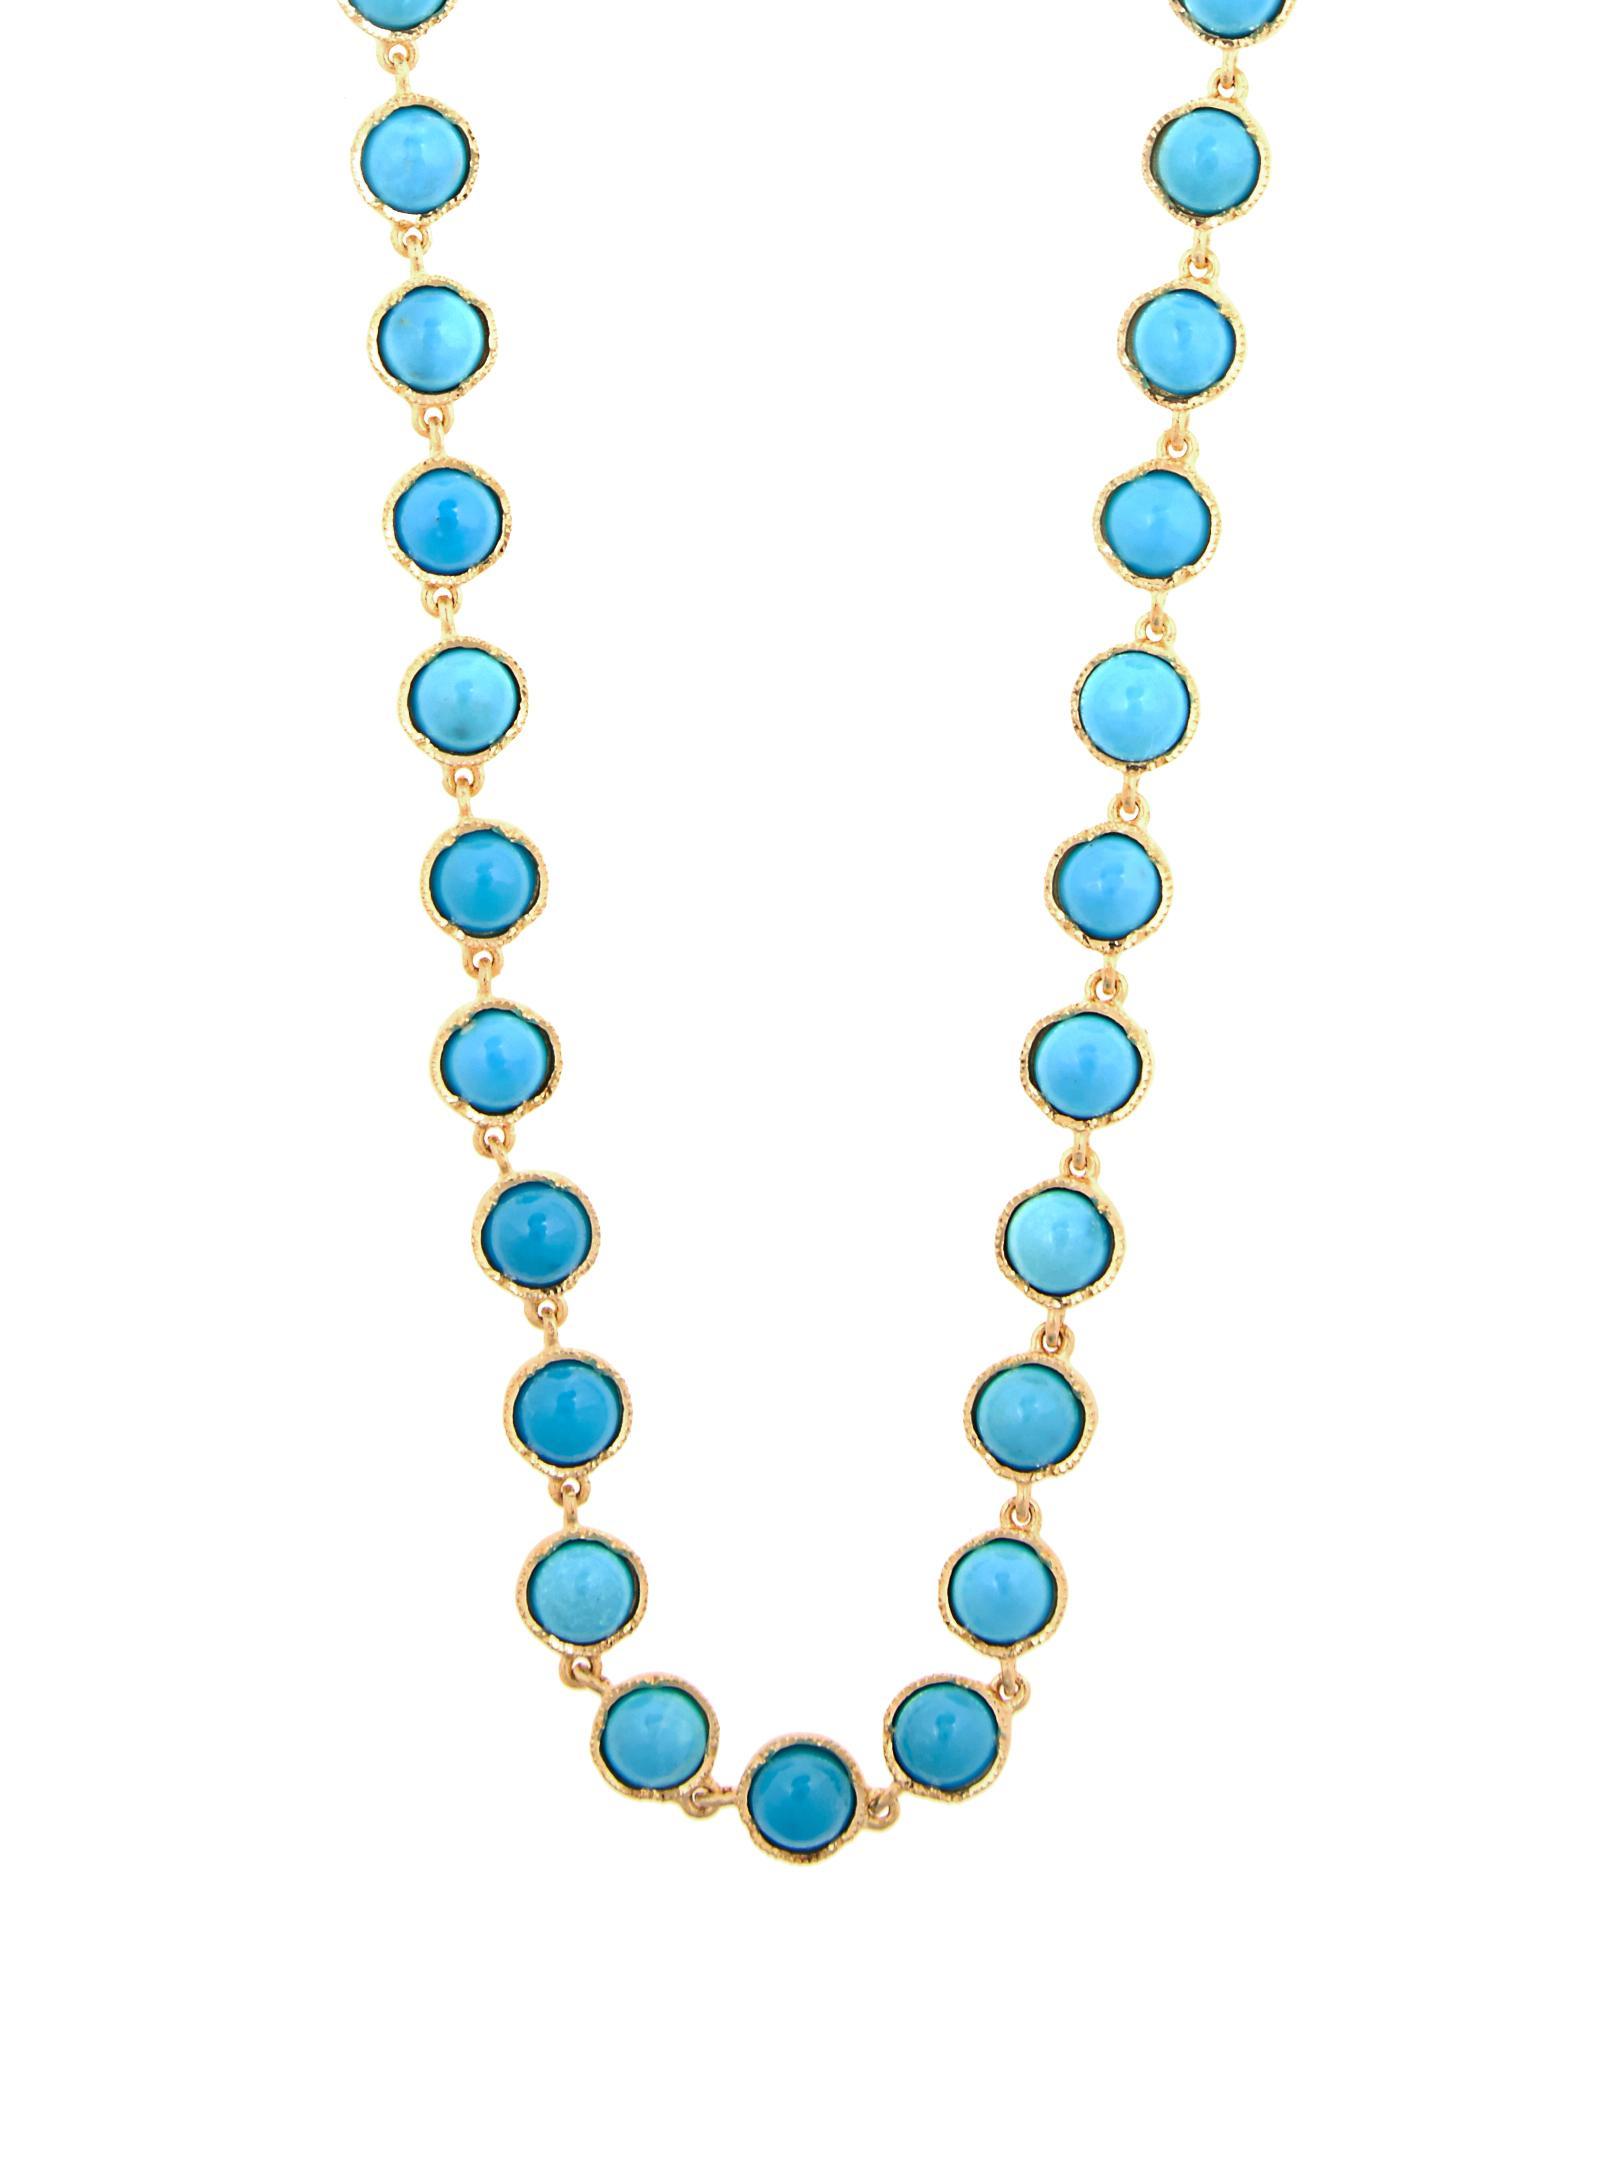 Irene Neuwirth Turquoise & Yellow-gold Necklace